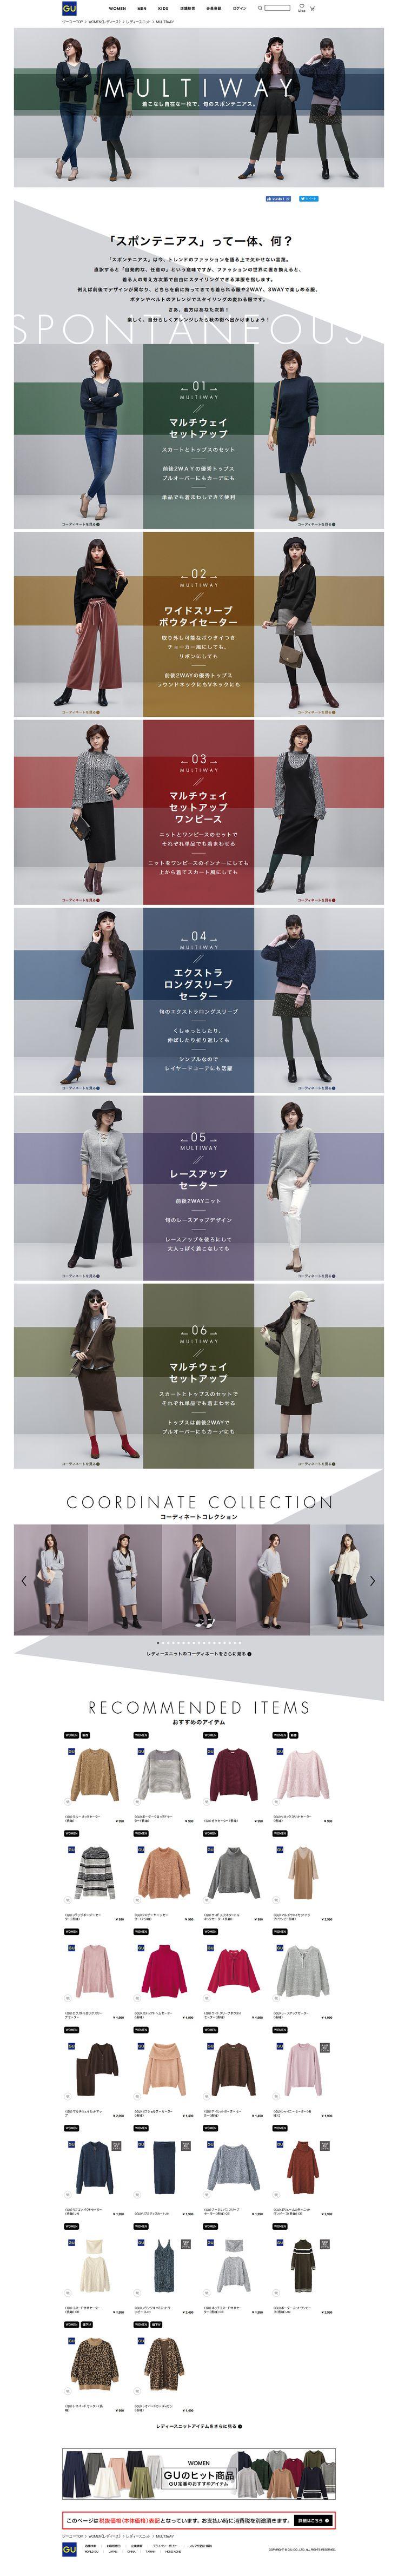 GU(ジーユー)MULTIWAY|着こなし自在な一枚で、旬のスポンテニアス。 http://www.gu-japan.com/feature/spontaneous/